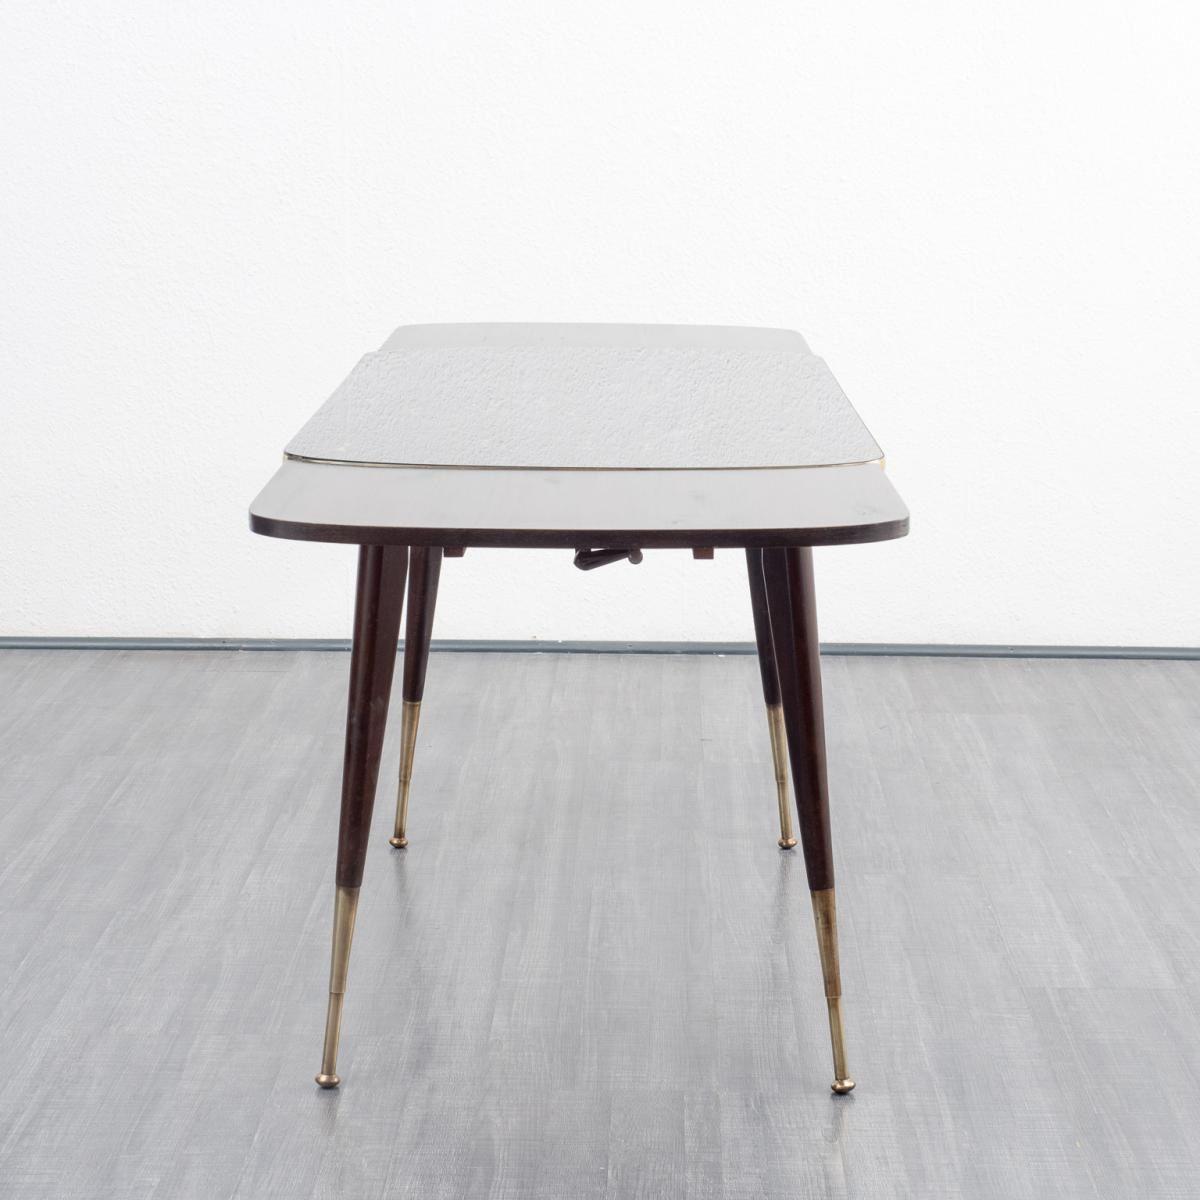 20 Condo Size Coffee Table Custom Home Office Furniture Check more